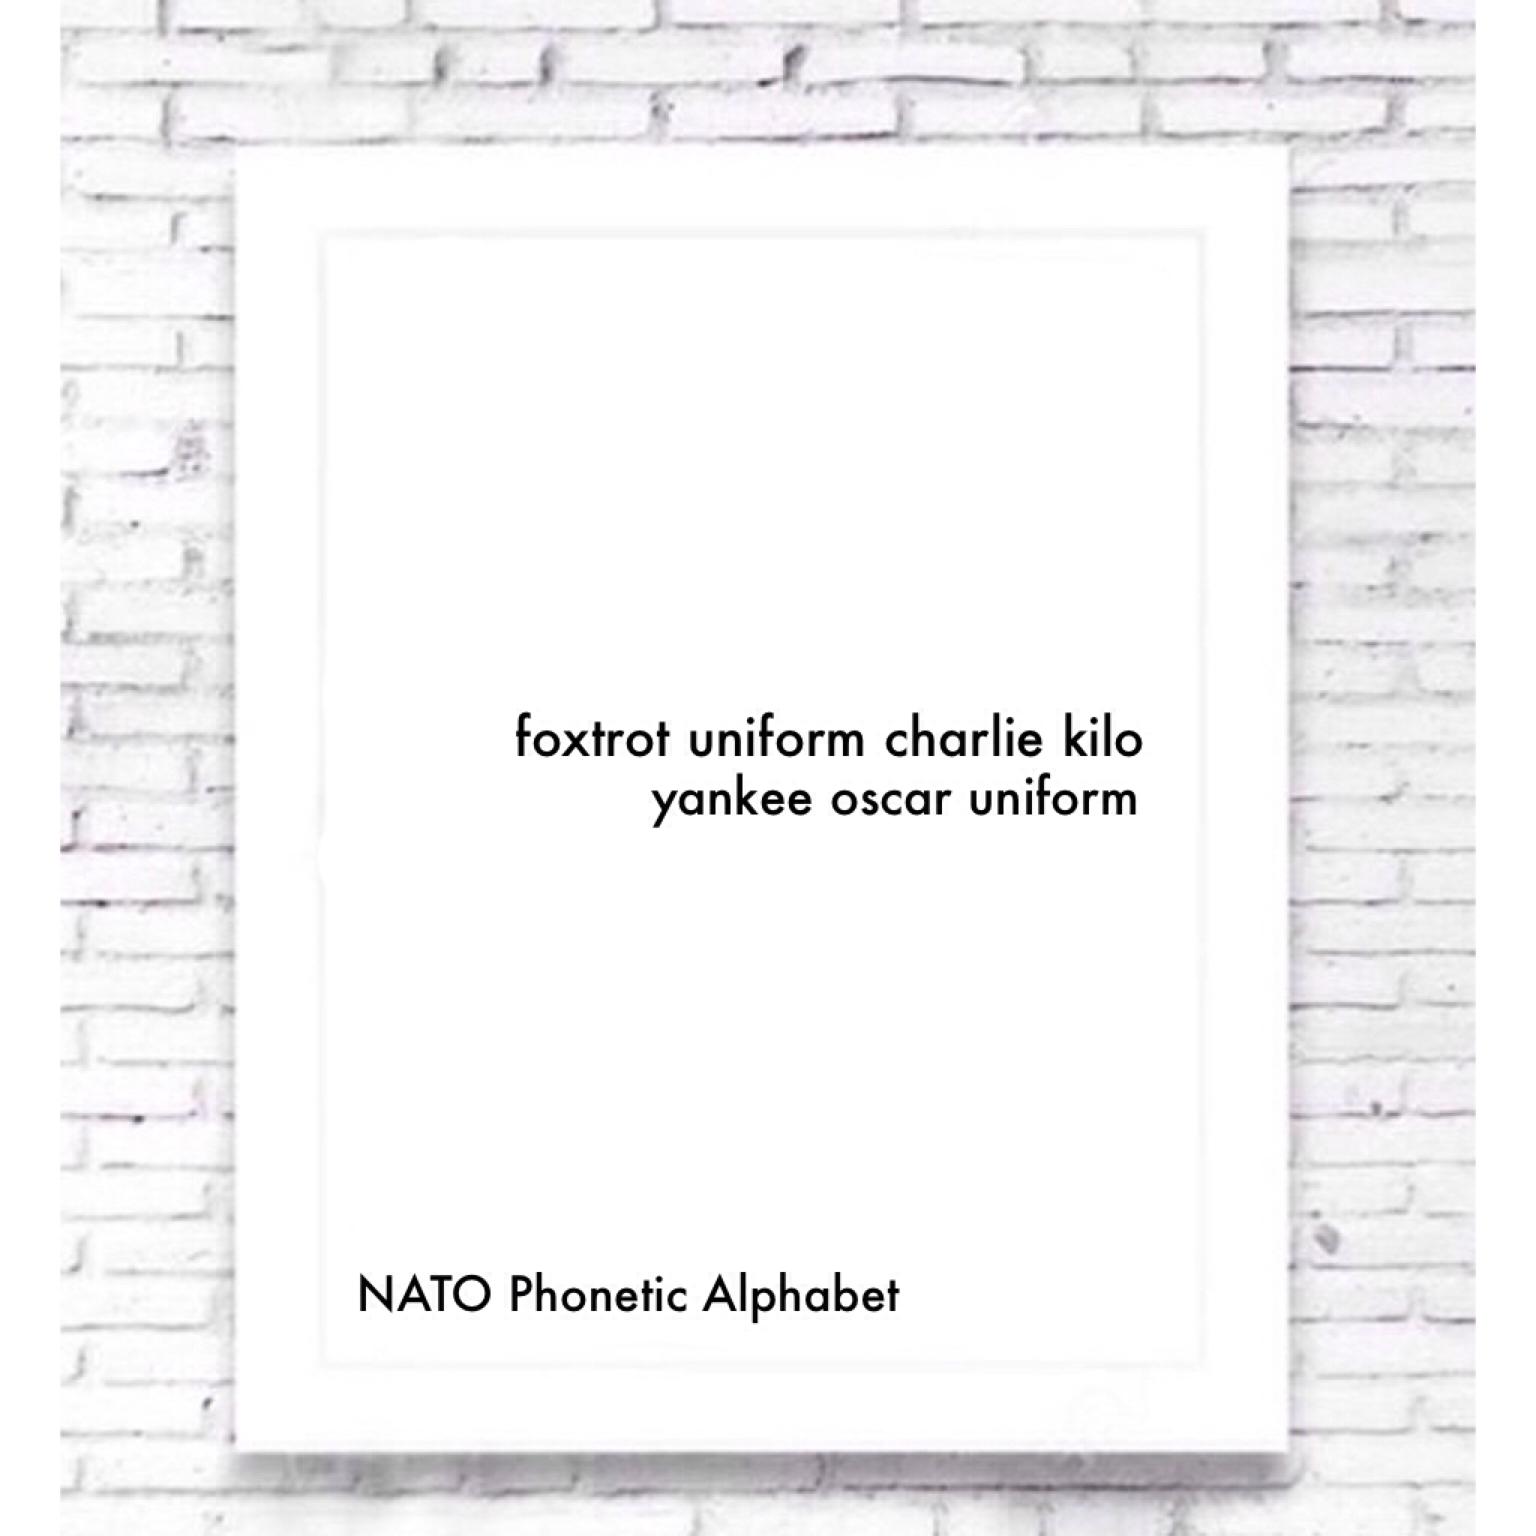 photo about Nato Phonetic Alphabet Printable titled Foxtrot Uniform Charlie Kilo NATO Phonetic Alphabet